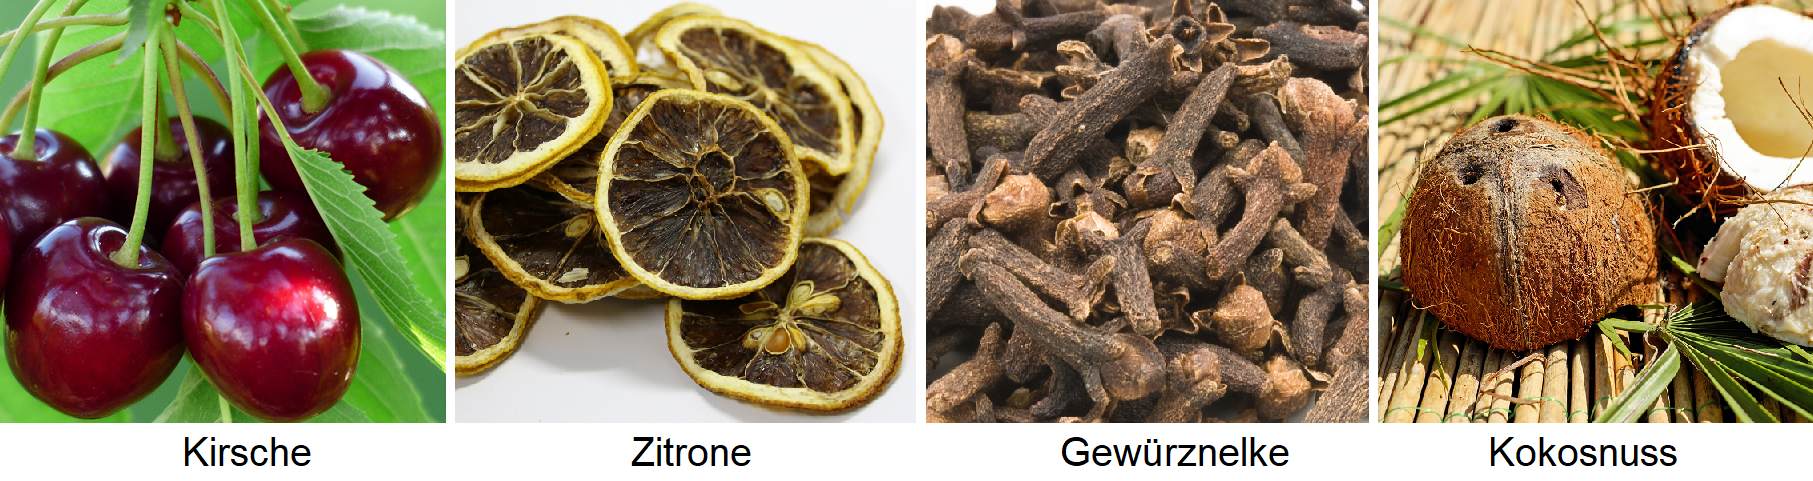 Aromas - cherry, lemon, clove, coconut